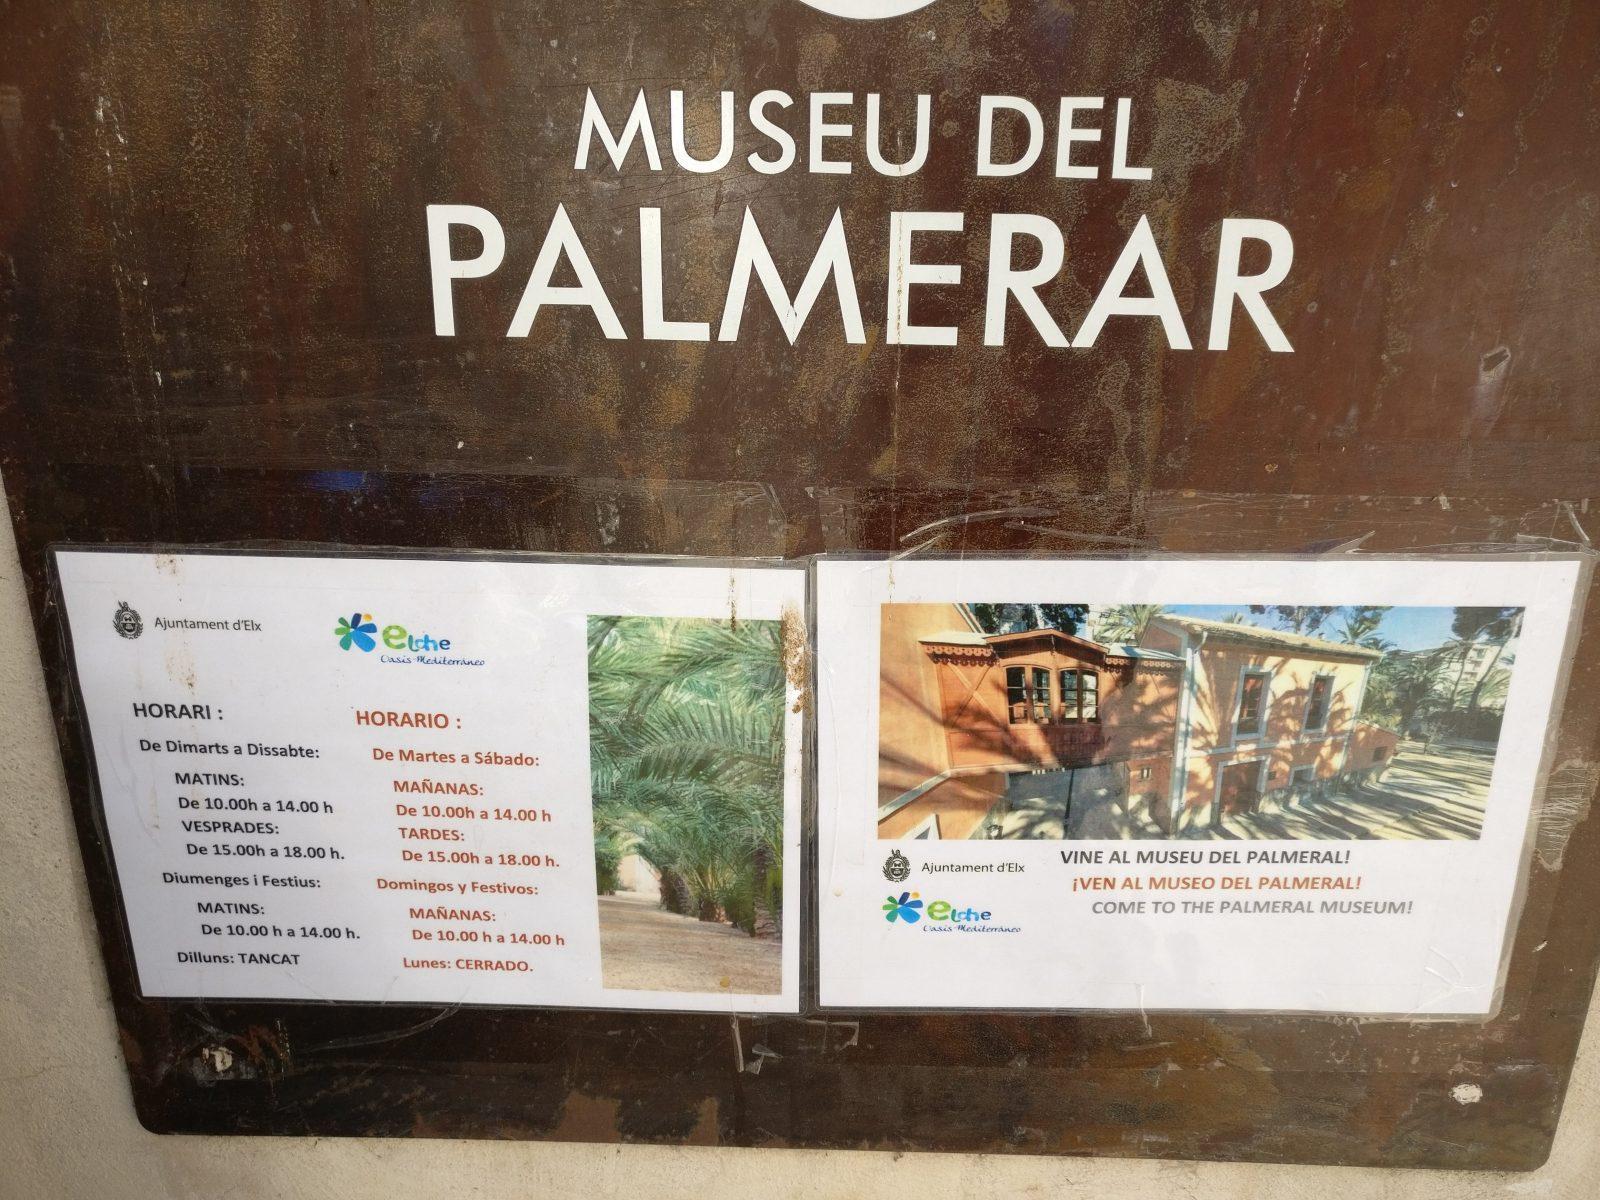 Museo del palmeral Elche